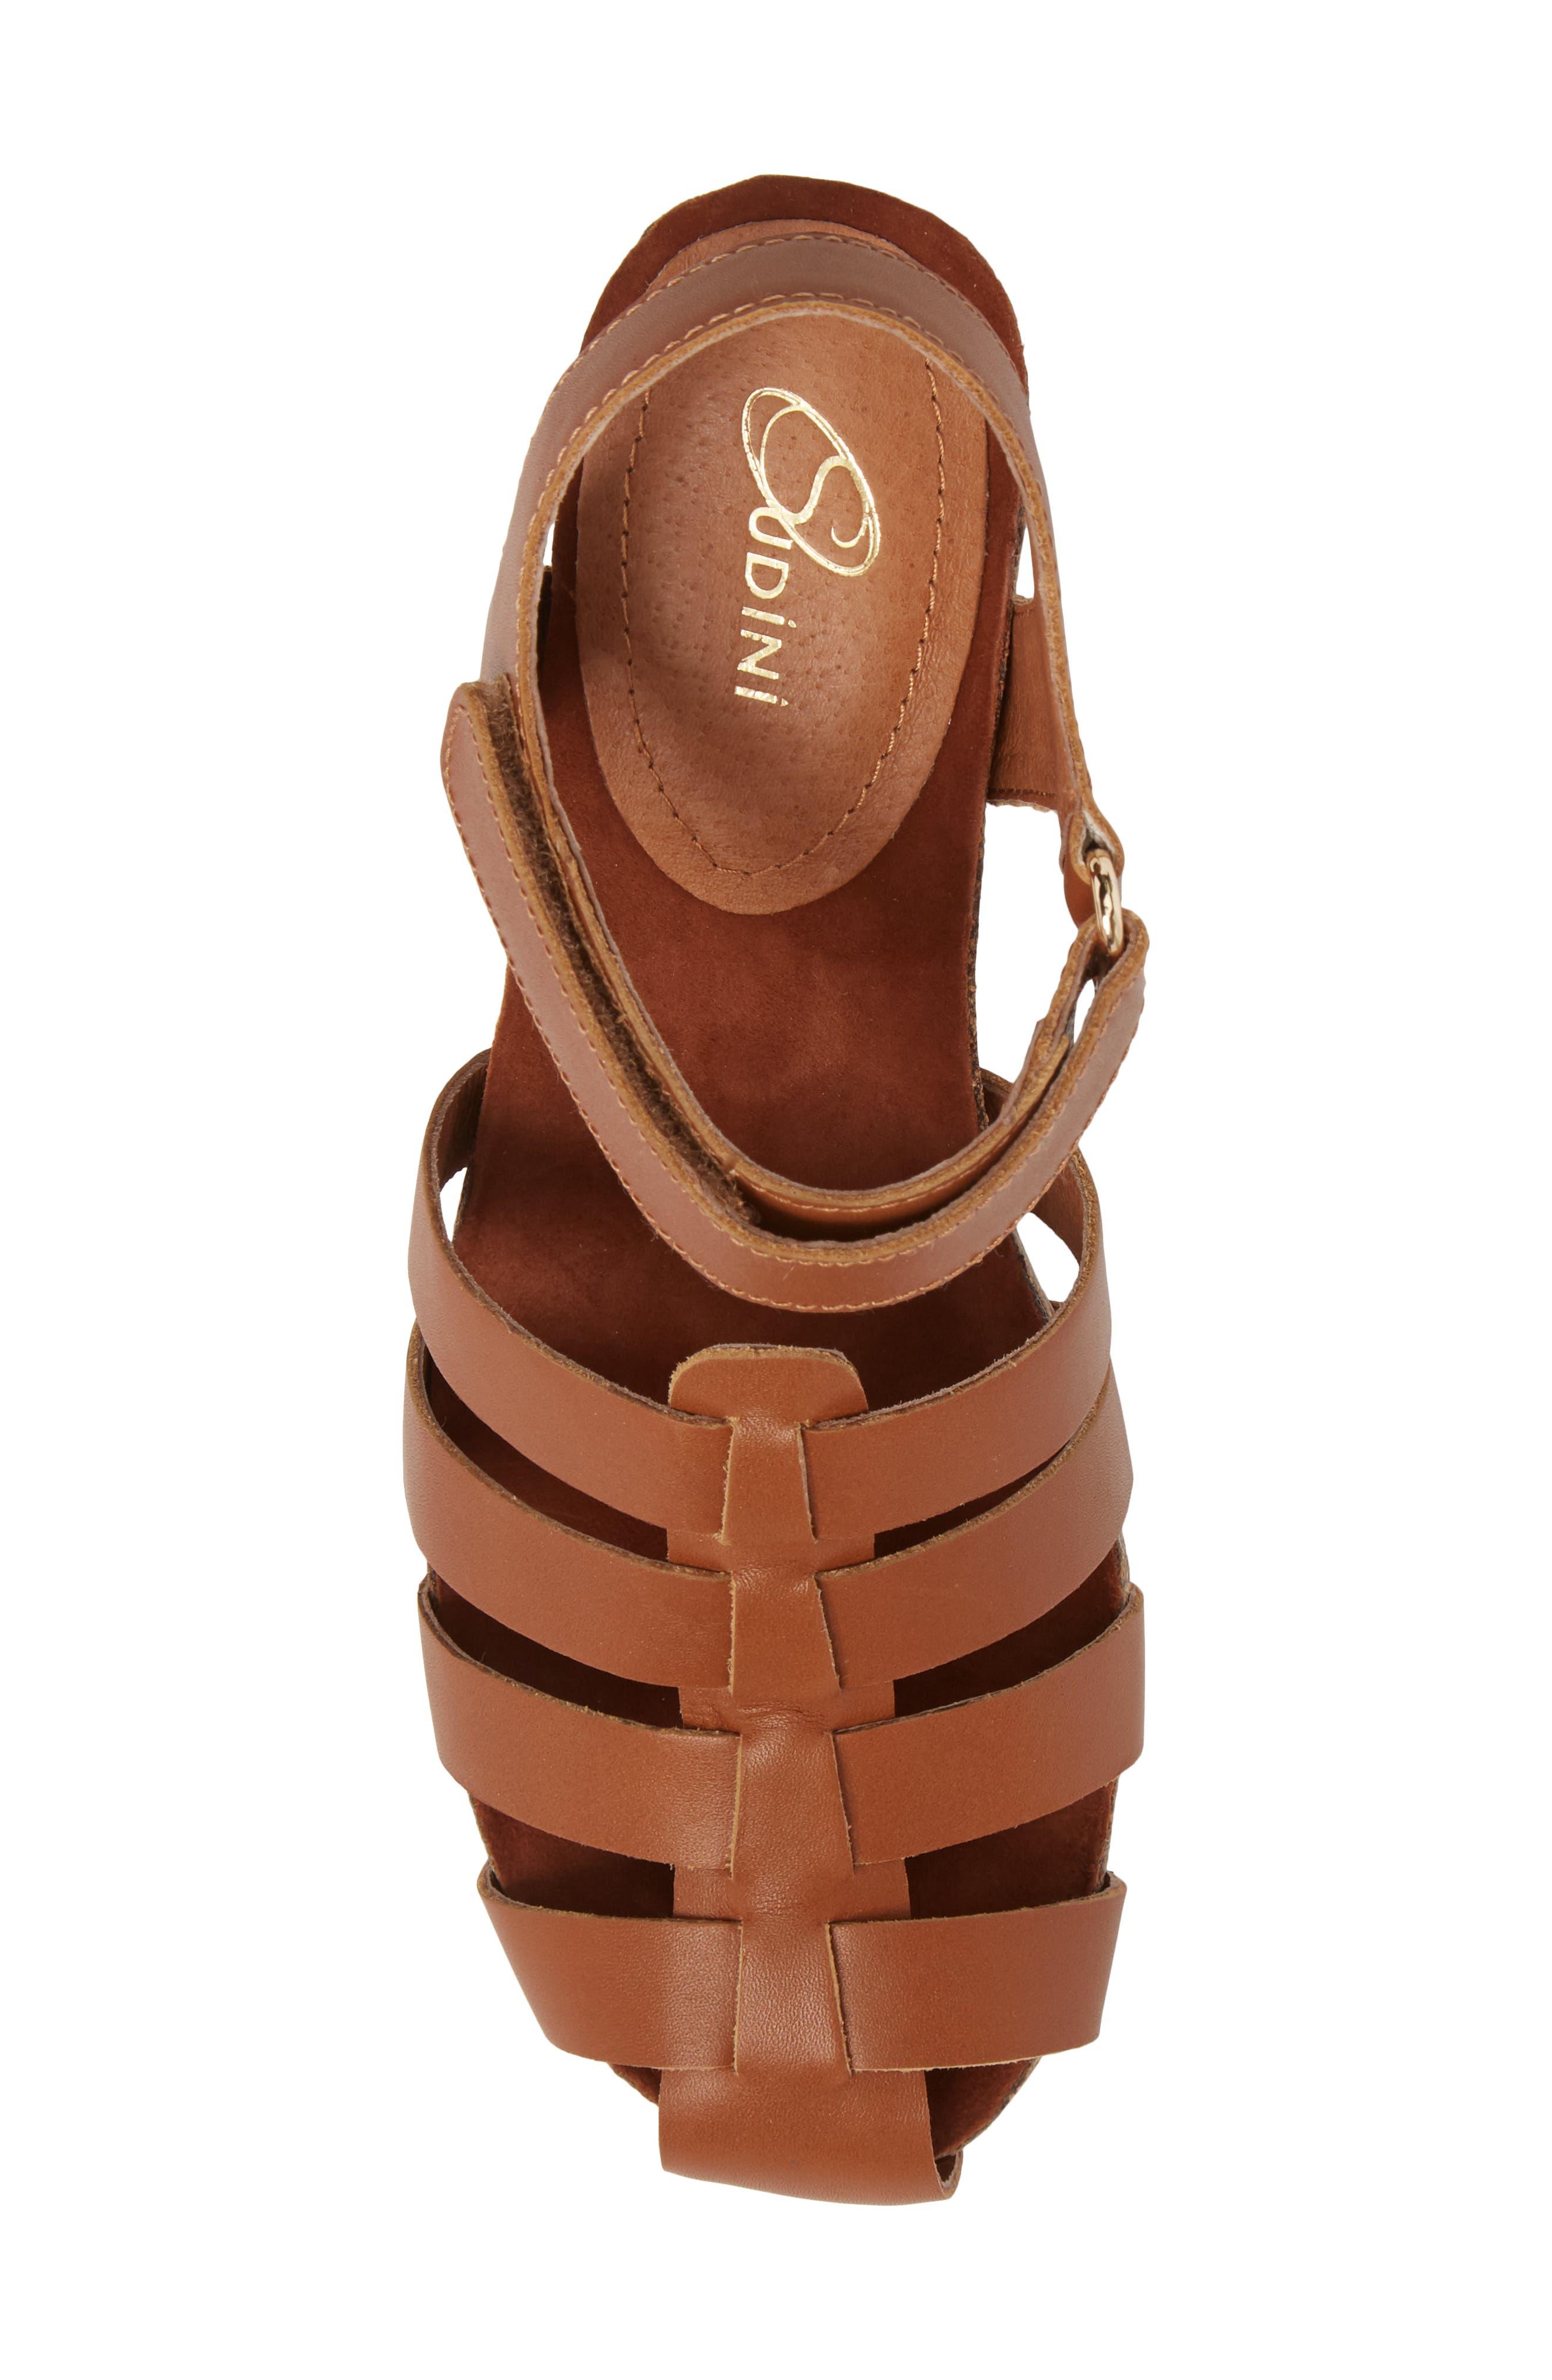 Carrara Block Heel Sandal,                             Alternate thumbnail 5, color,                             Cognac Leather